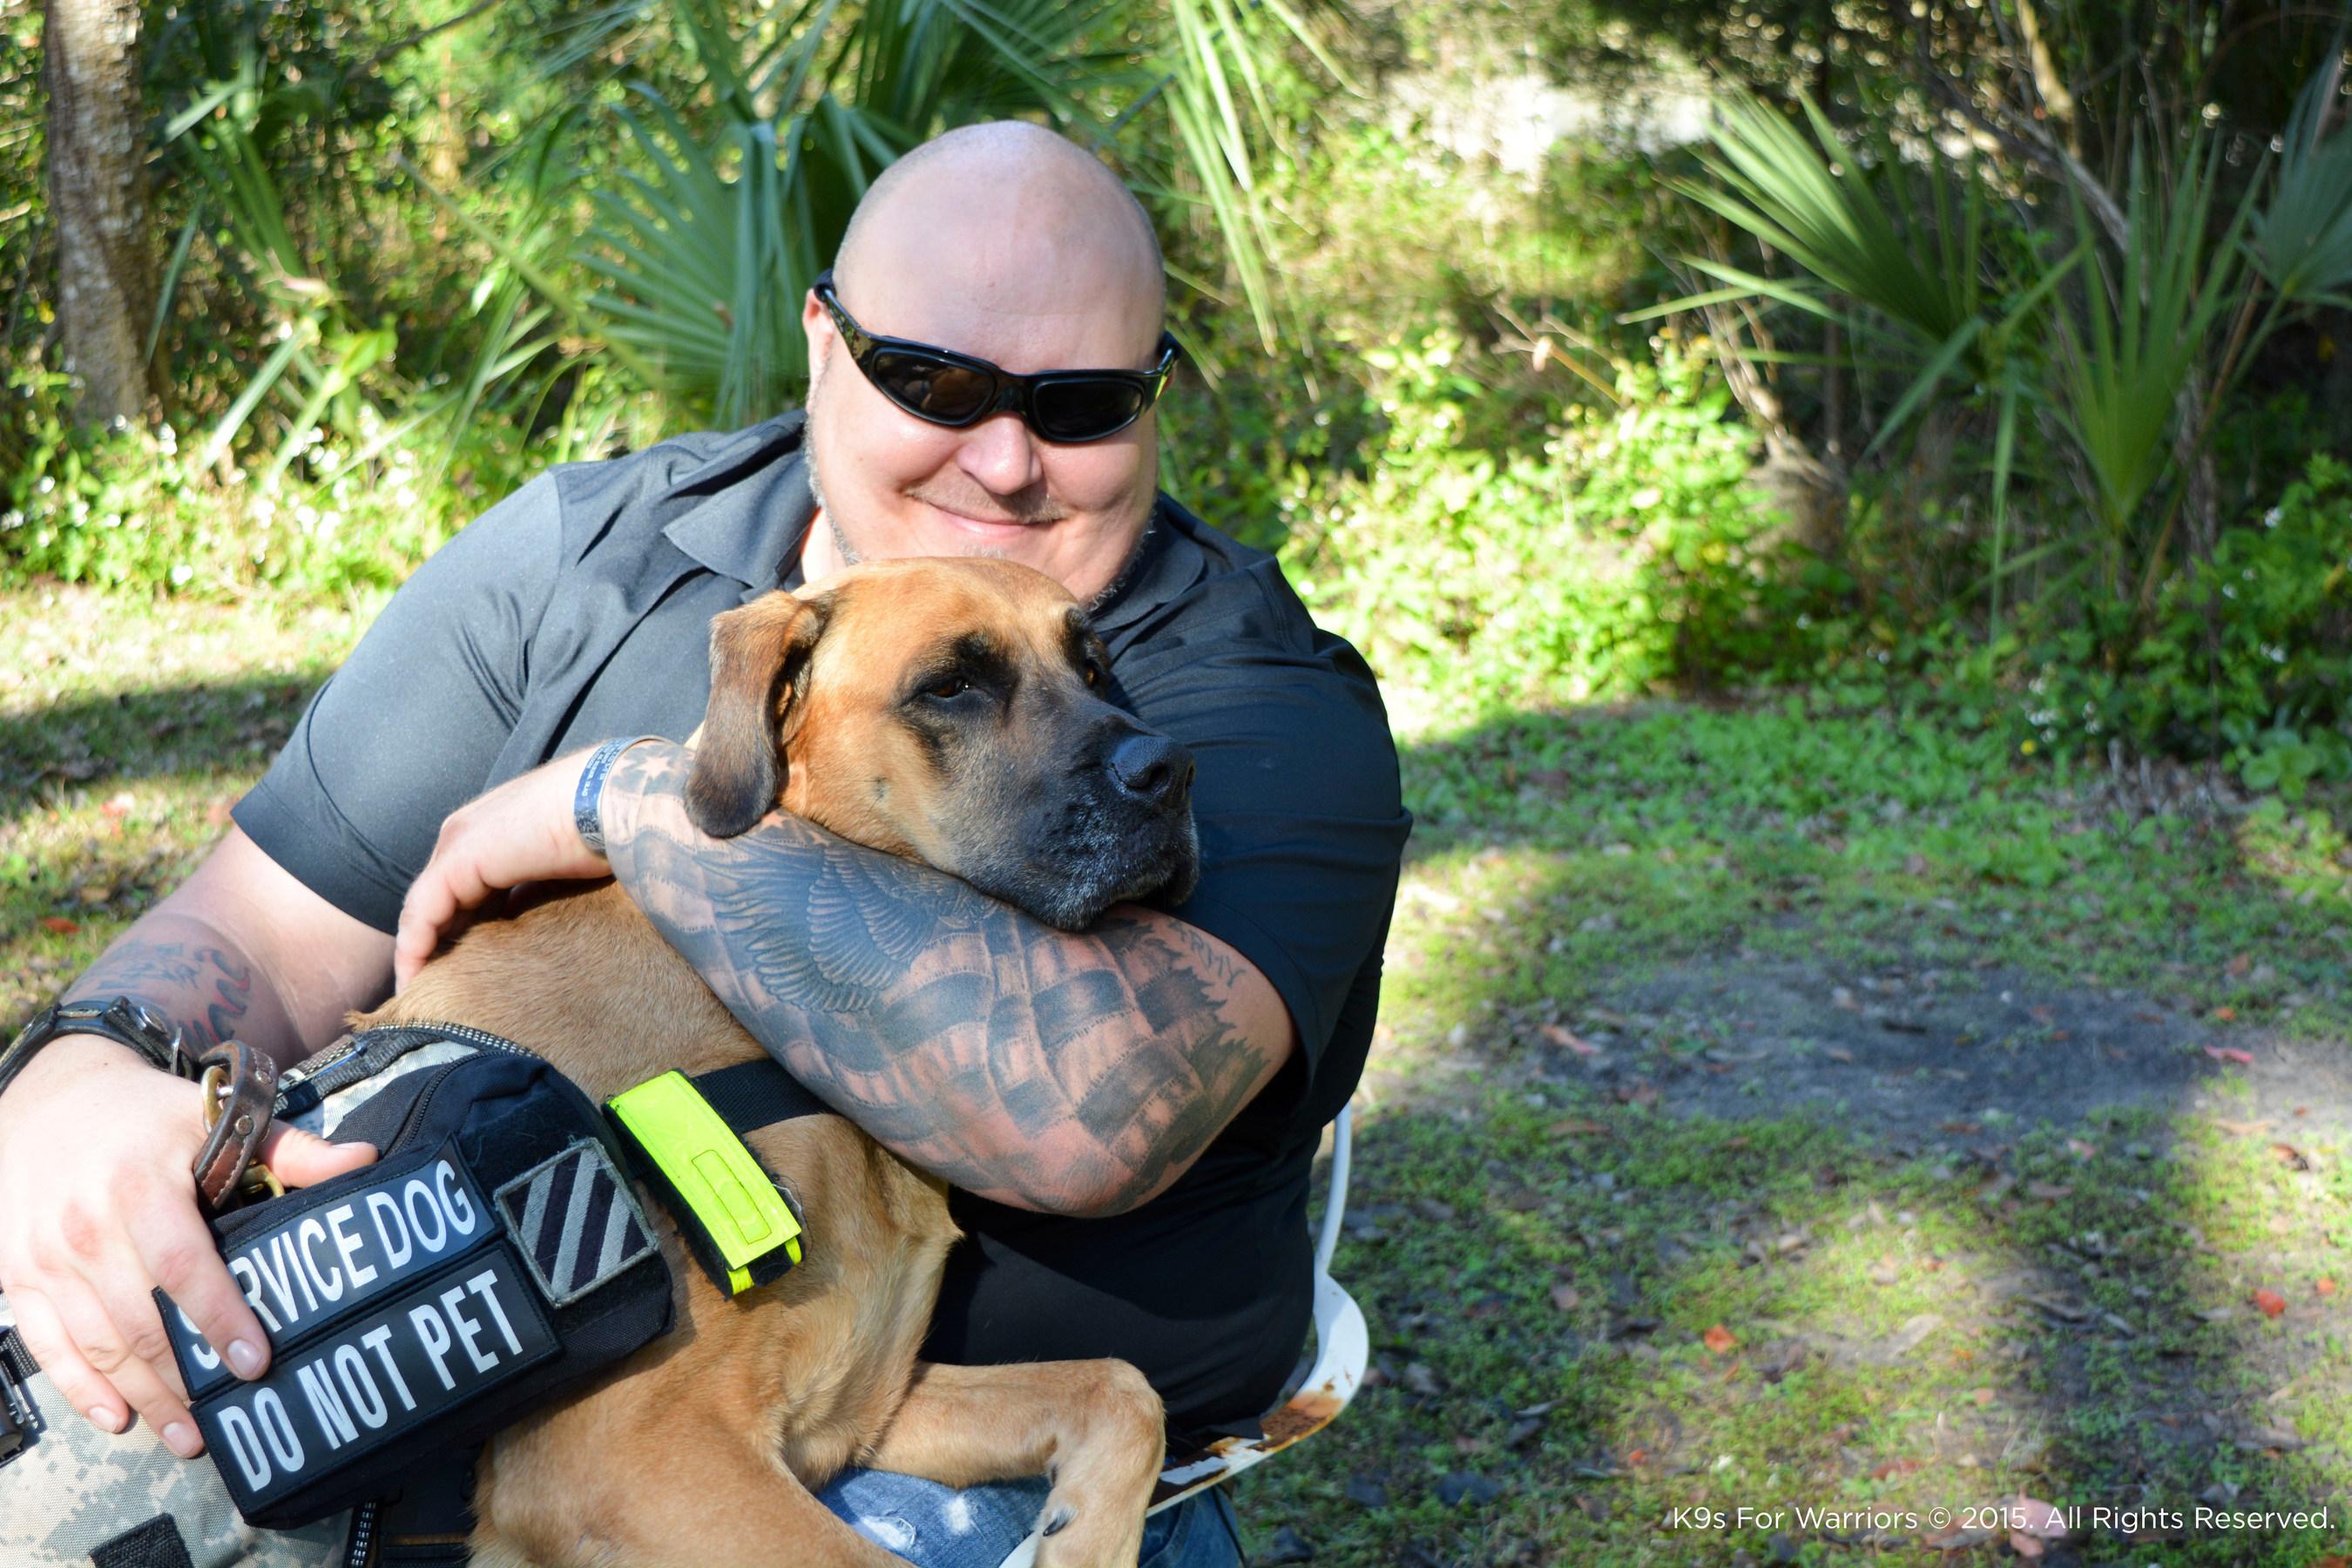 Sergeant First Class U.S. Army (Ret.) Joe Swoboda embraces his service dog Lily.